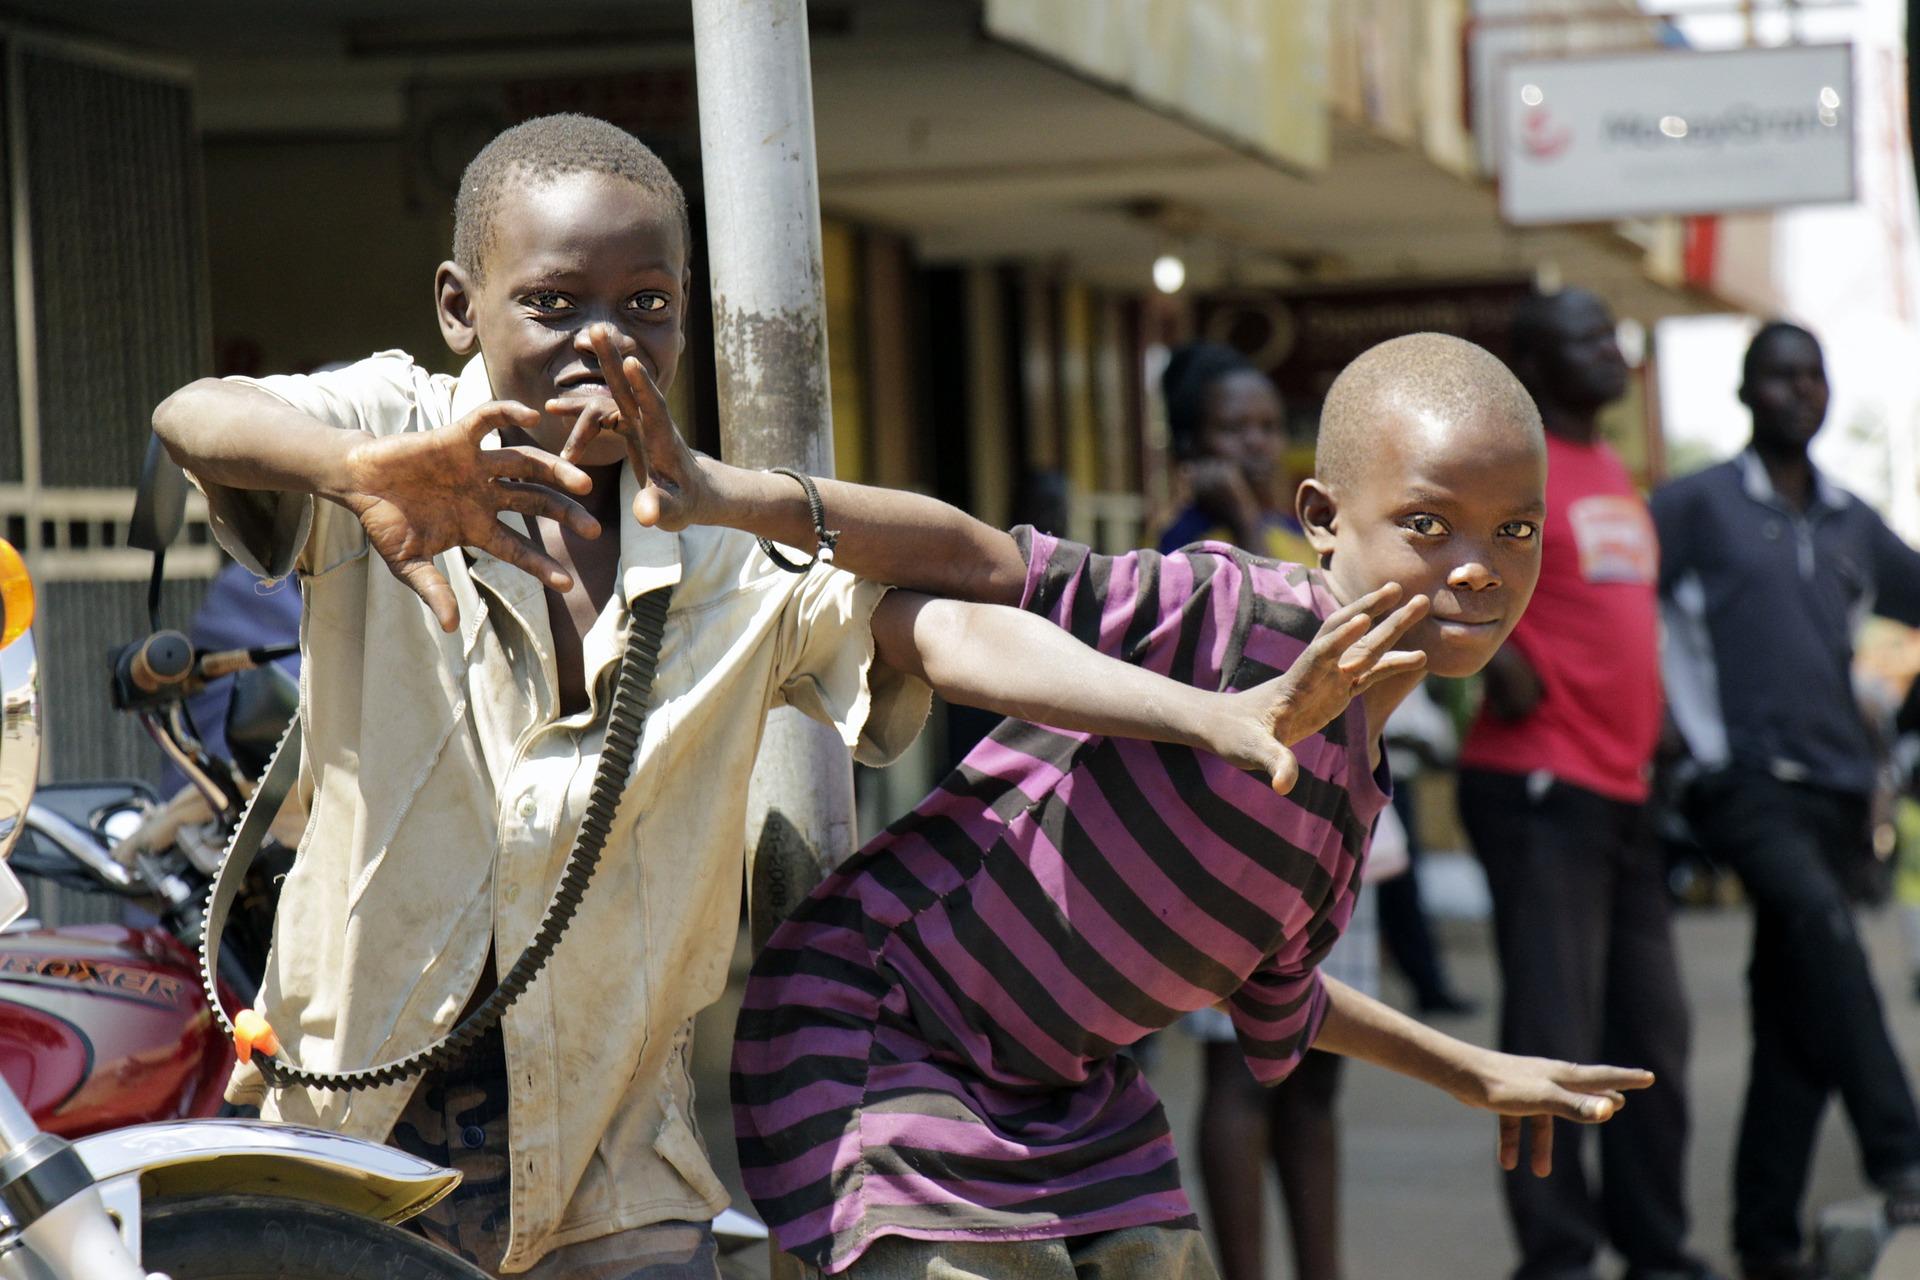 Myth Bustes - Challenge Your Perception of Street Children